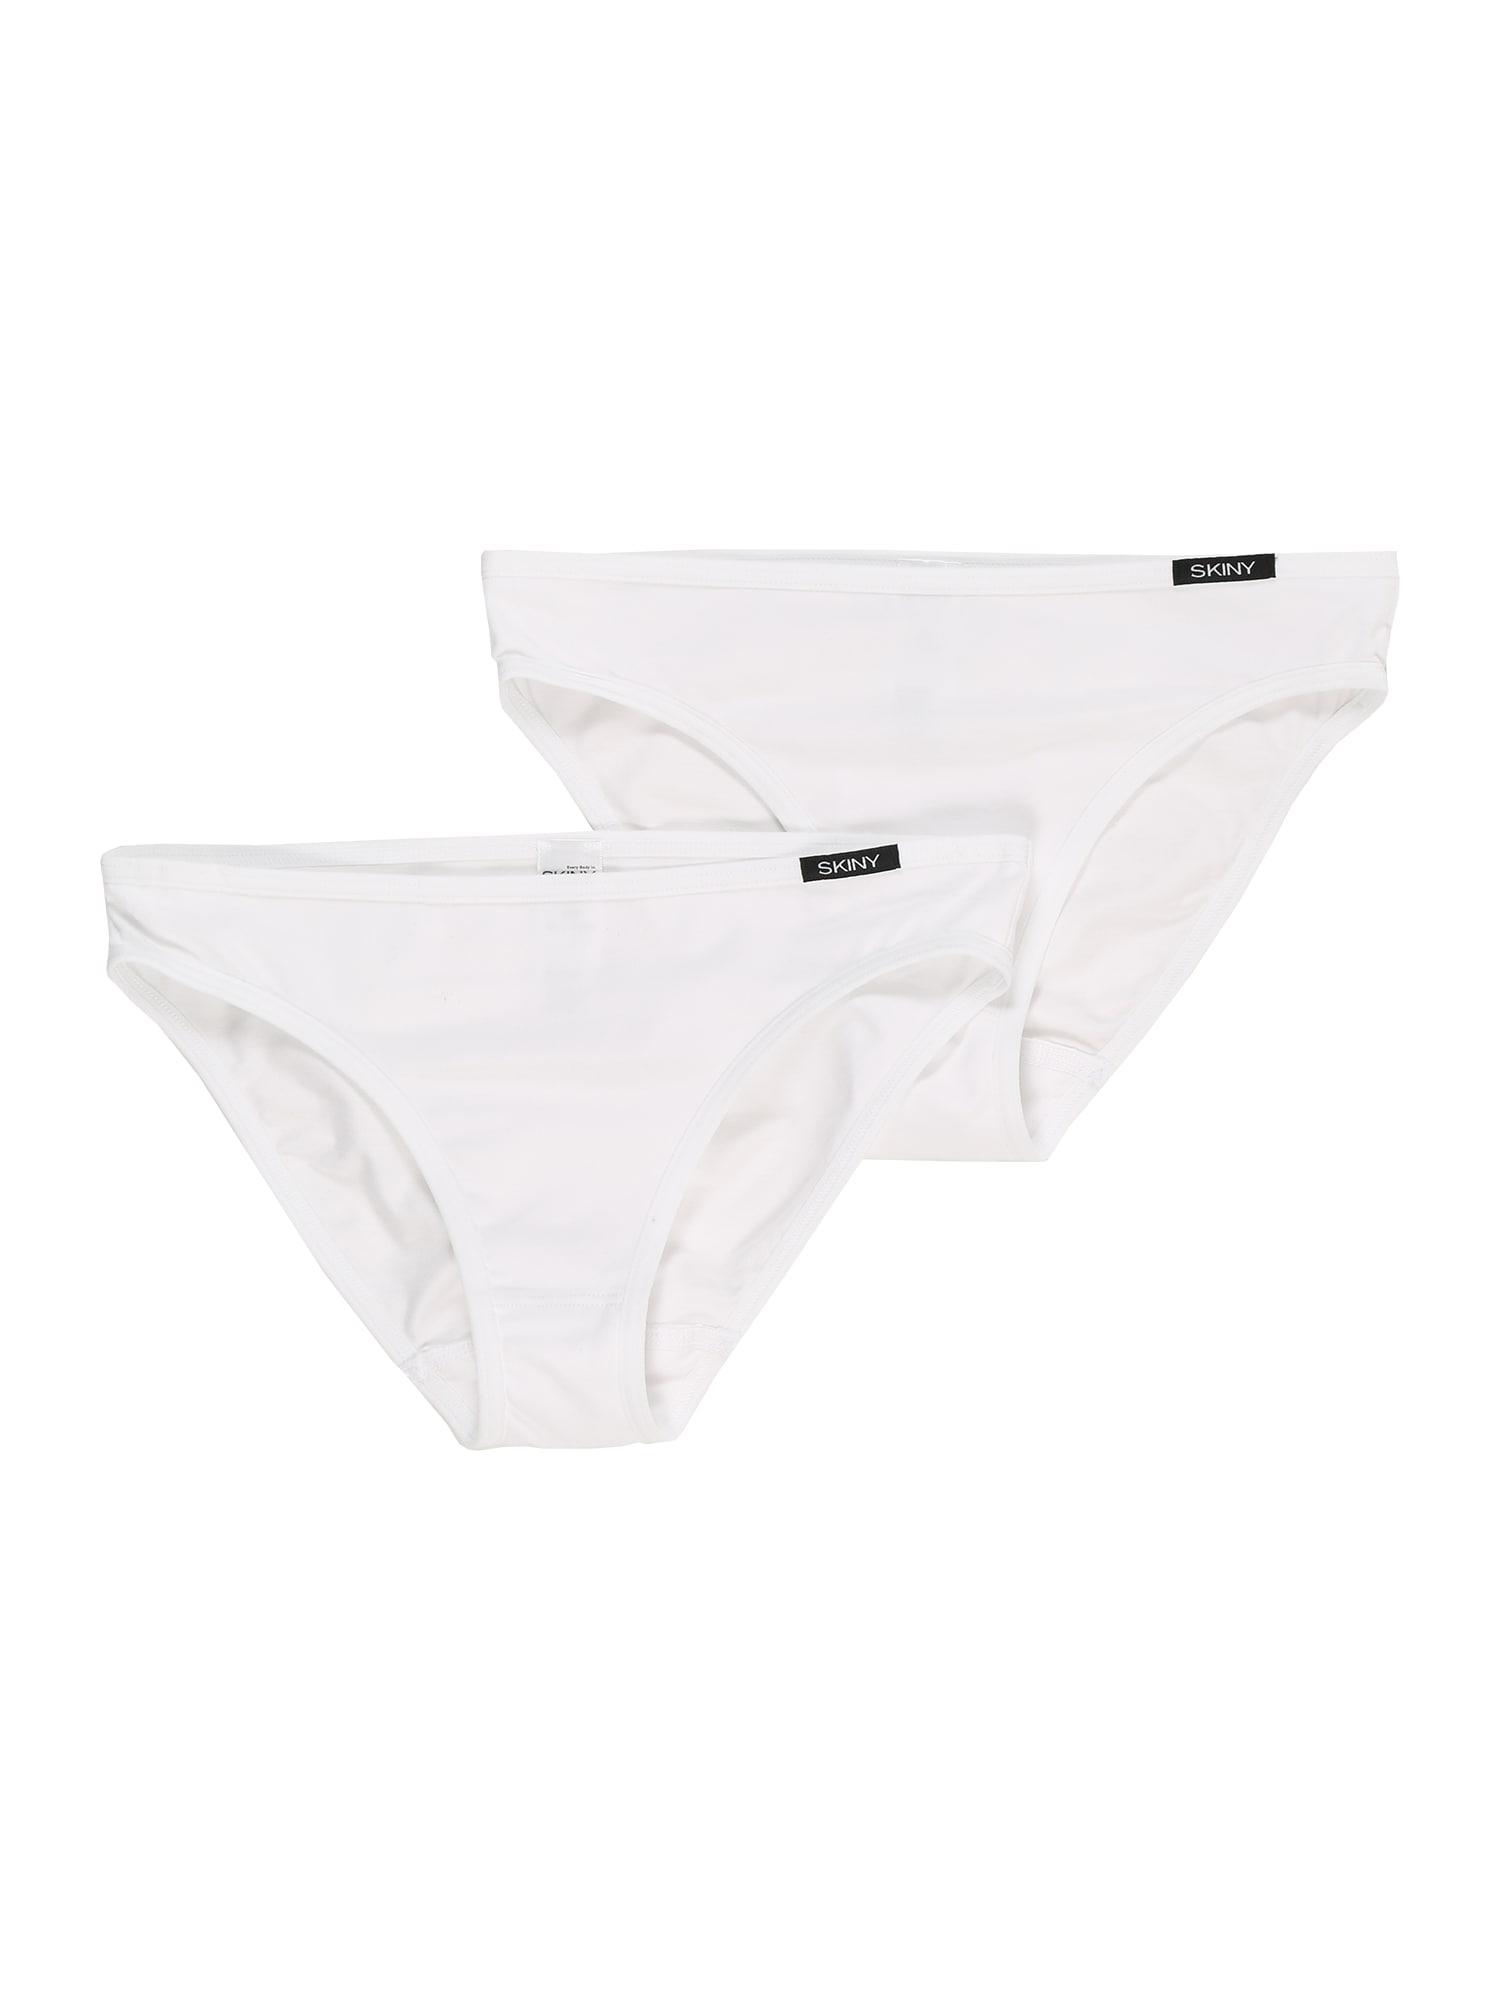 Skiny Spodní prádlo 'Essentials'  bílá